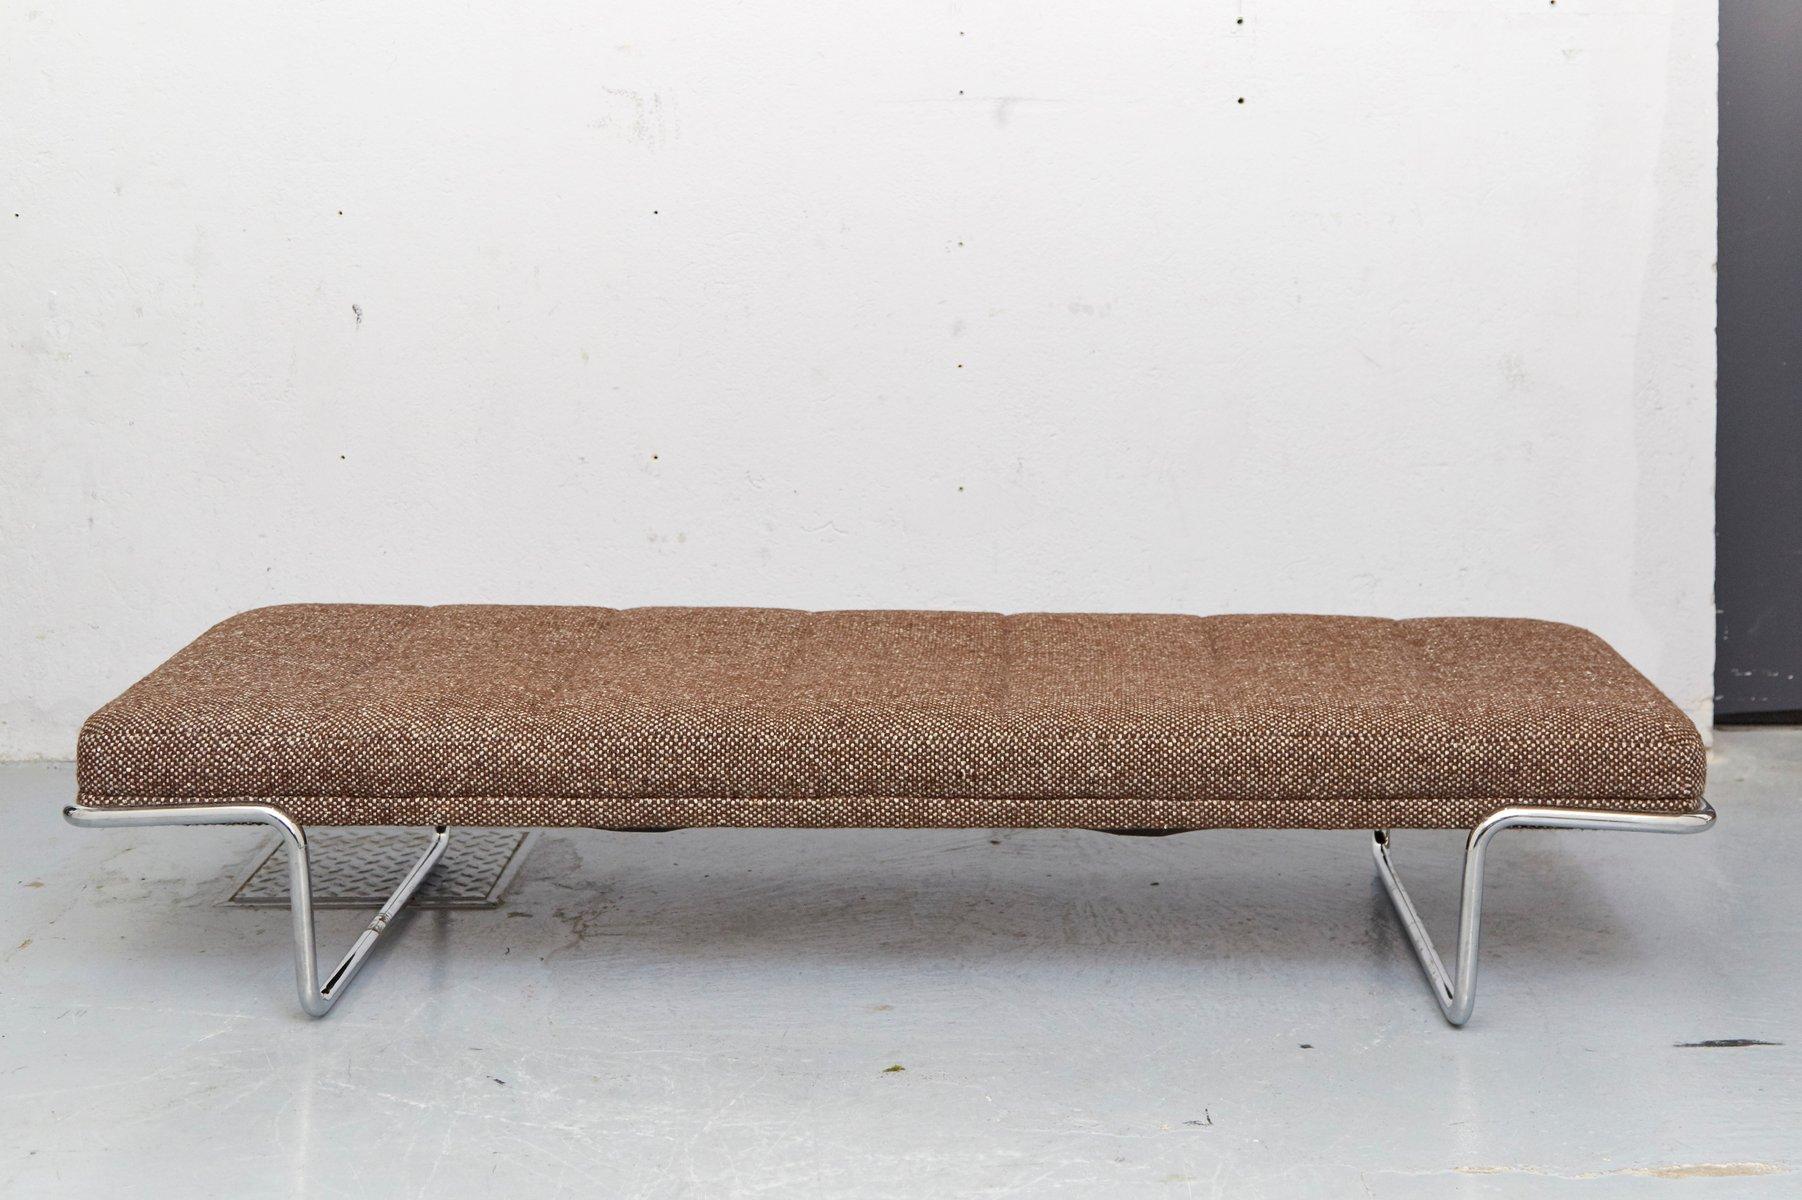 vintage tagesbett von bernd m nzebrock f r walter knoll. Black Bedroom Furniture Sets. Home Design Ideas